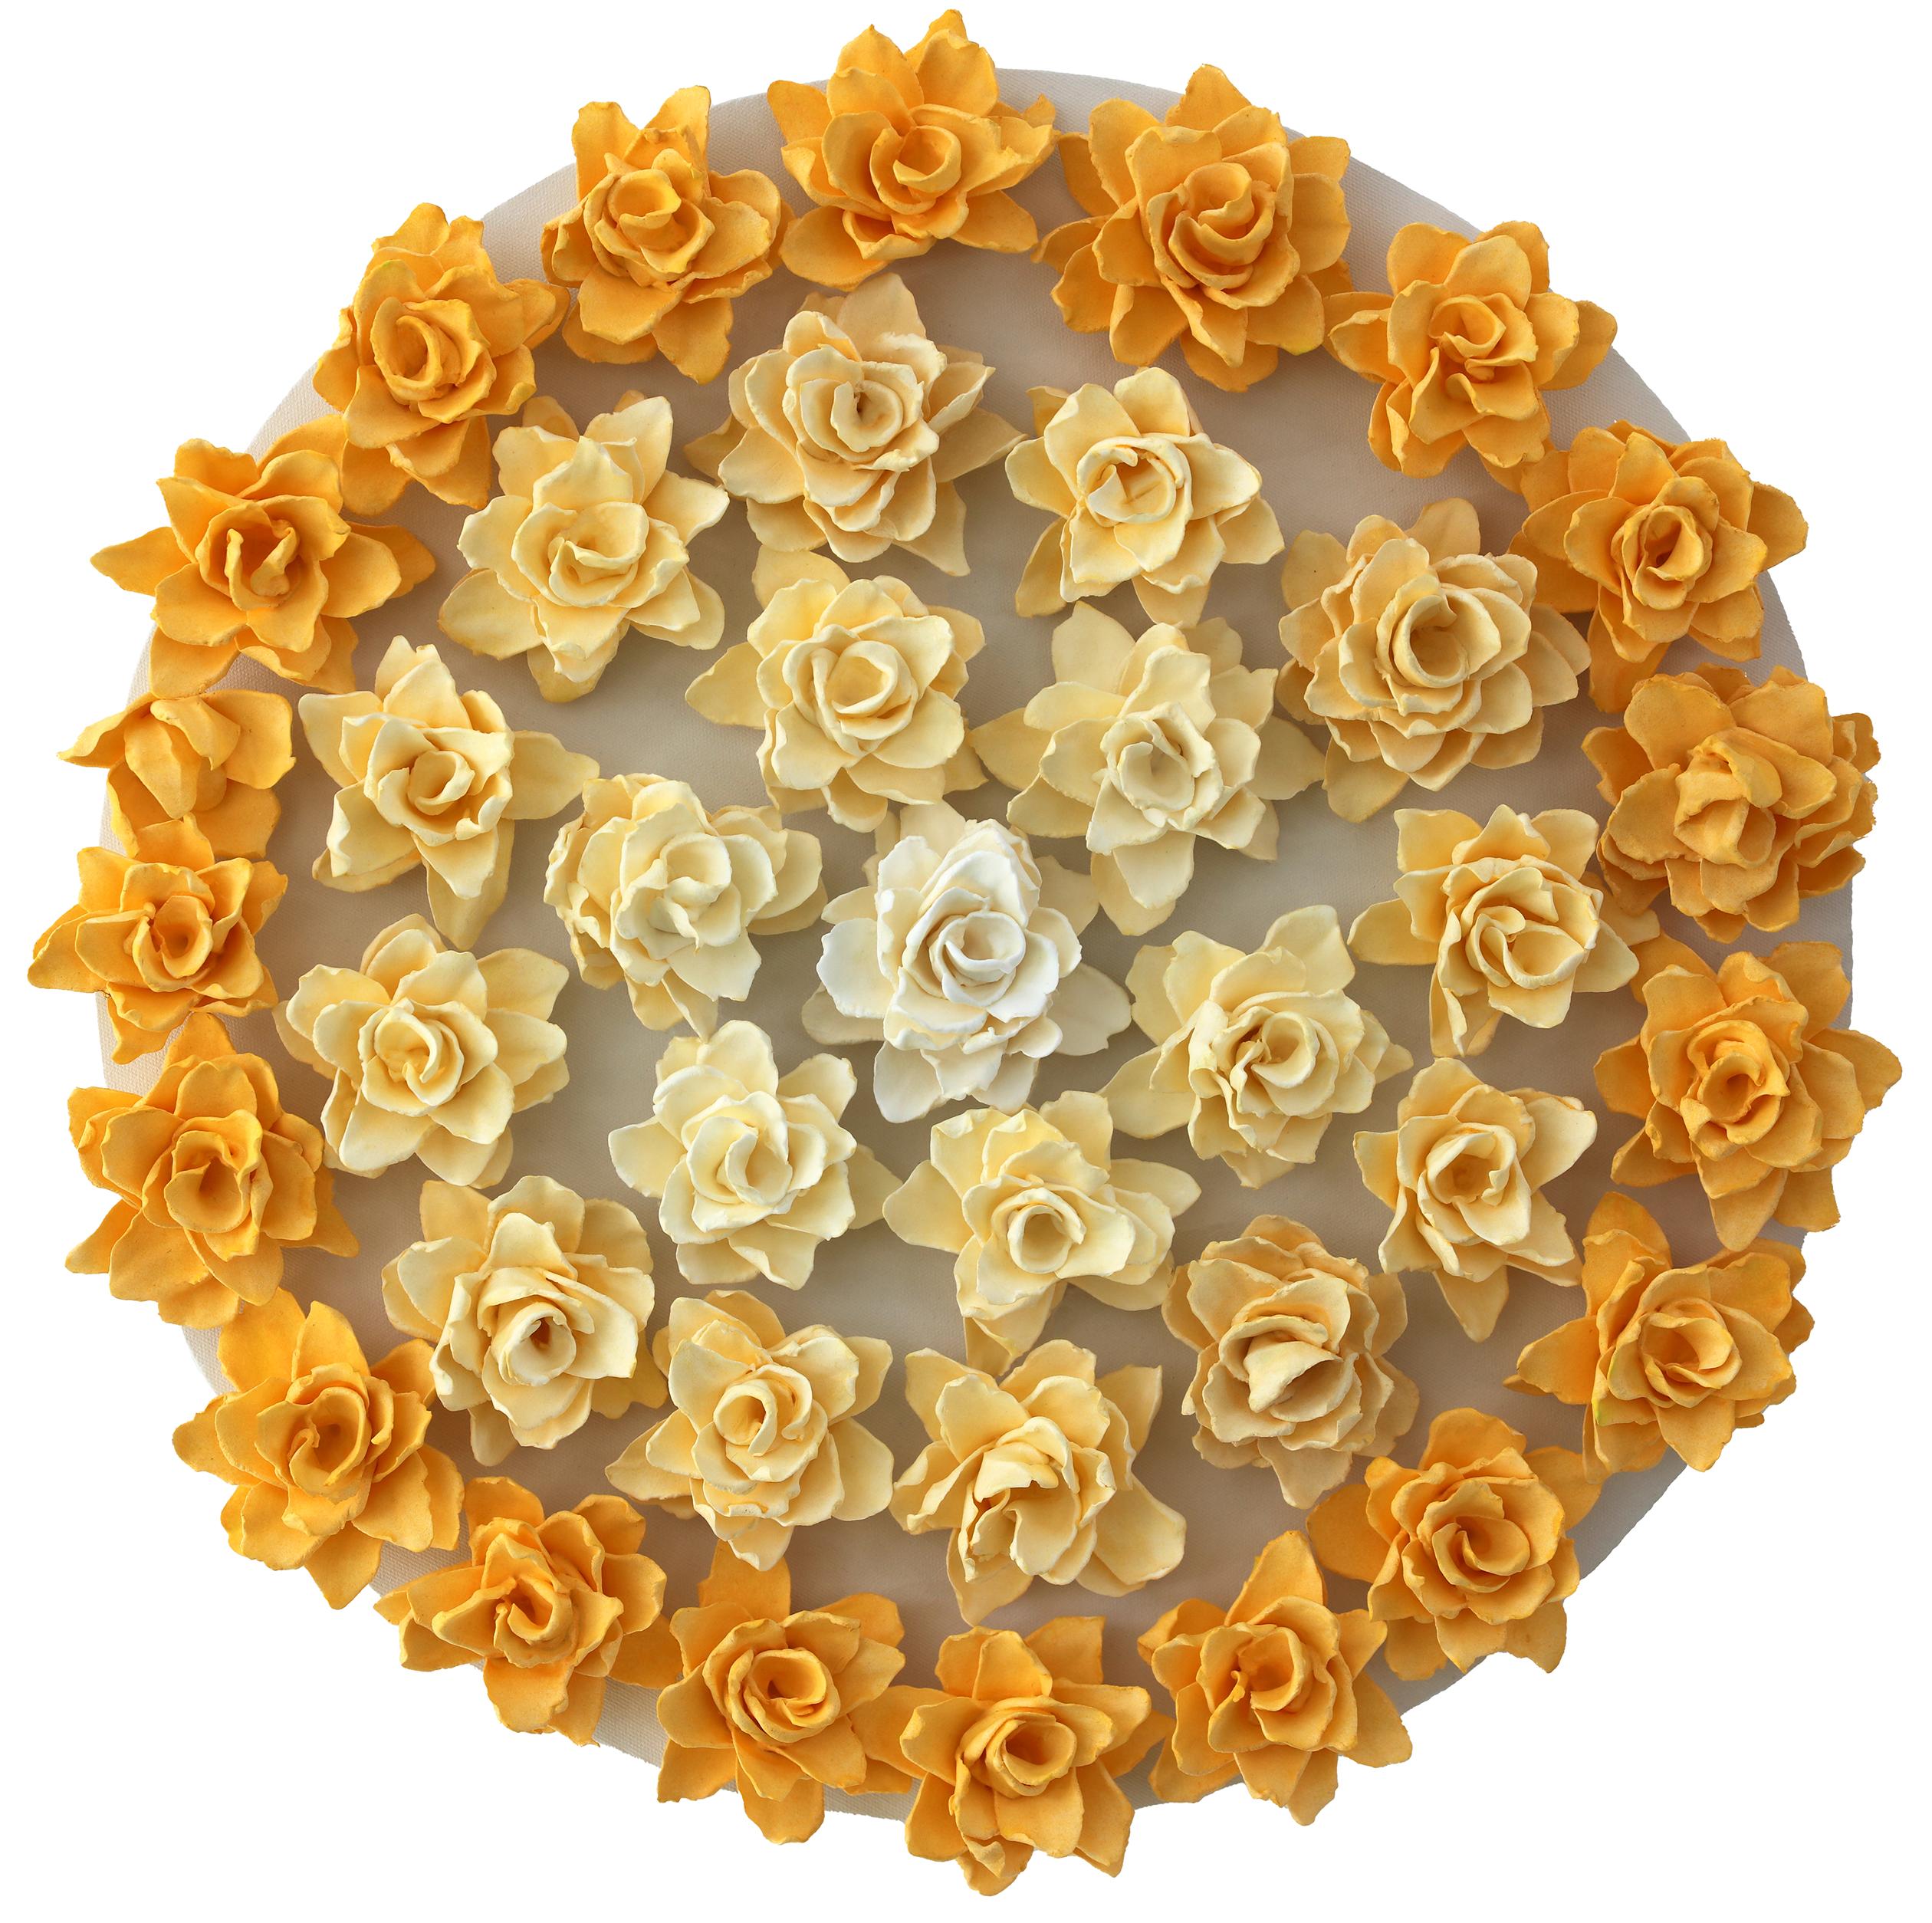 Mandala jaune white smaller orig image bx0y2q